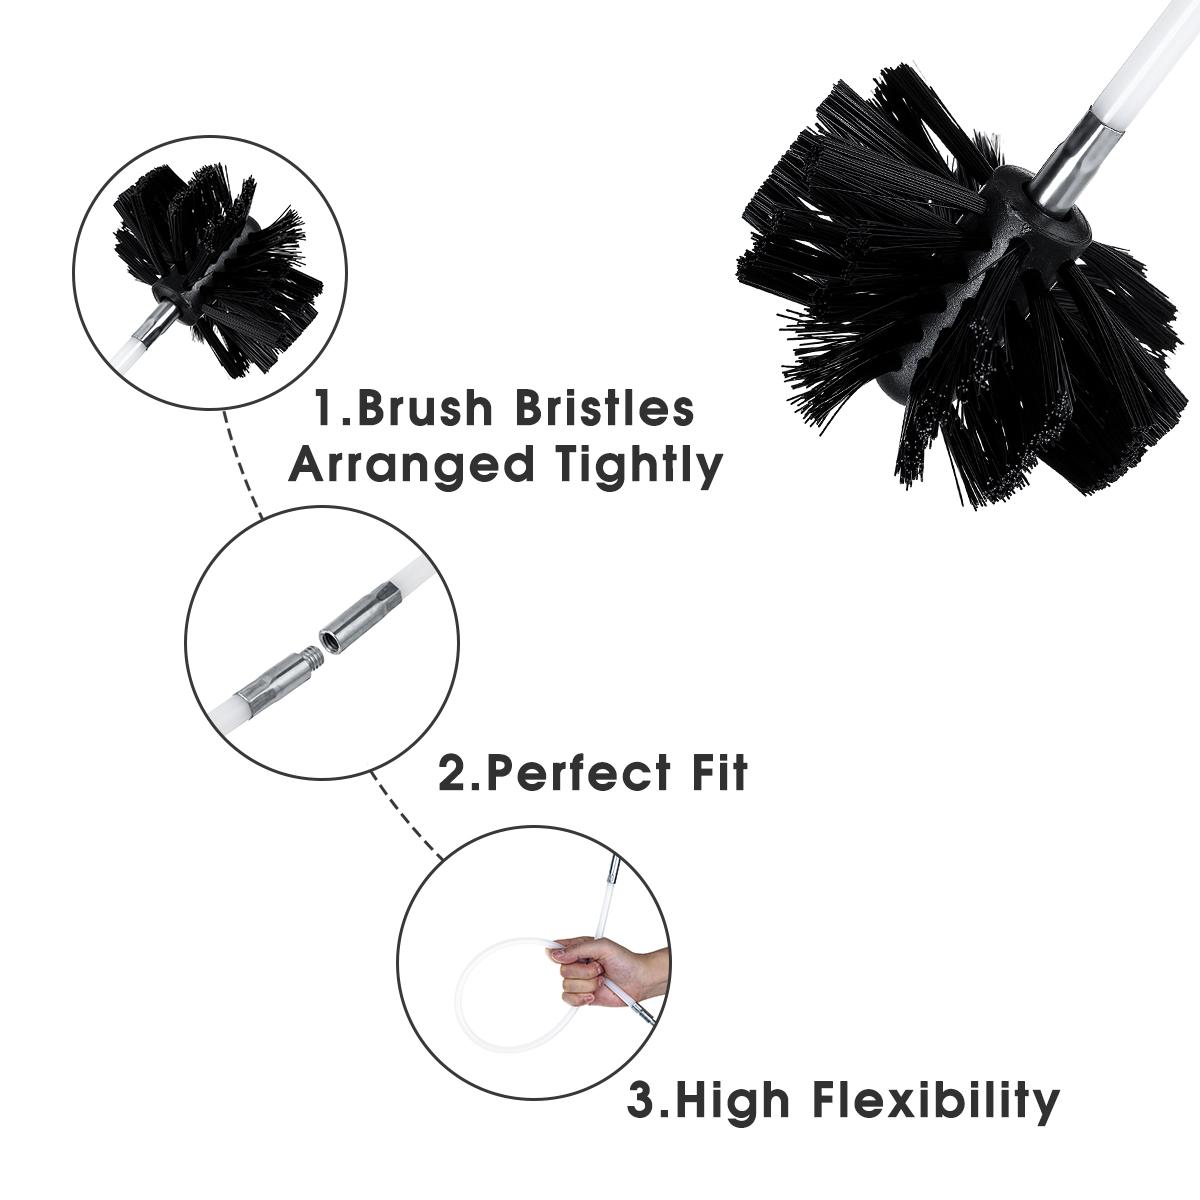 Chimney-Cleaning-Brush-Chimney-Pipe-Inner-Wall-Cleaner-Brush-Bendable thumbnail 2